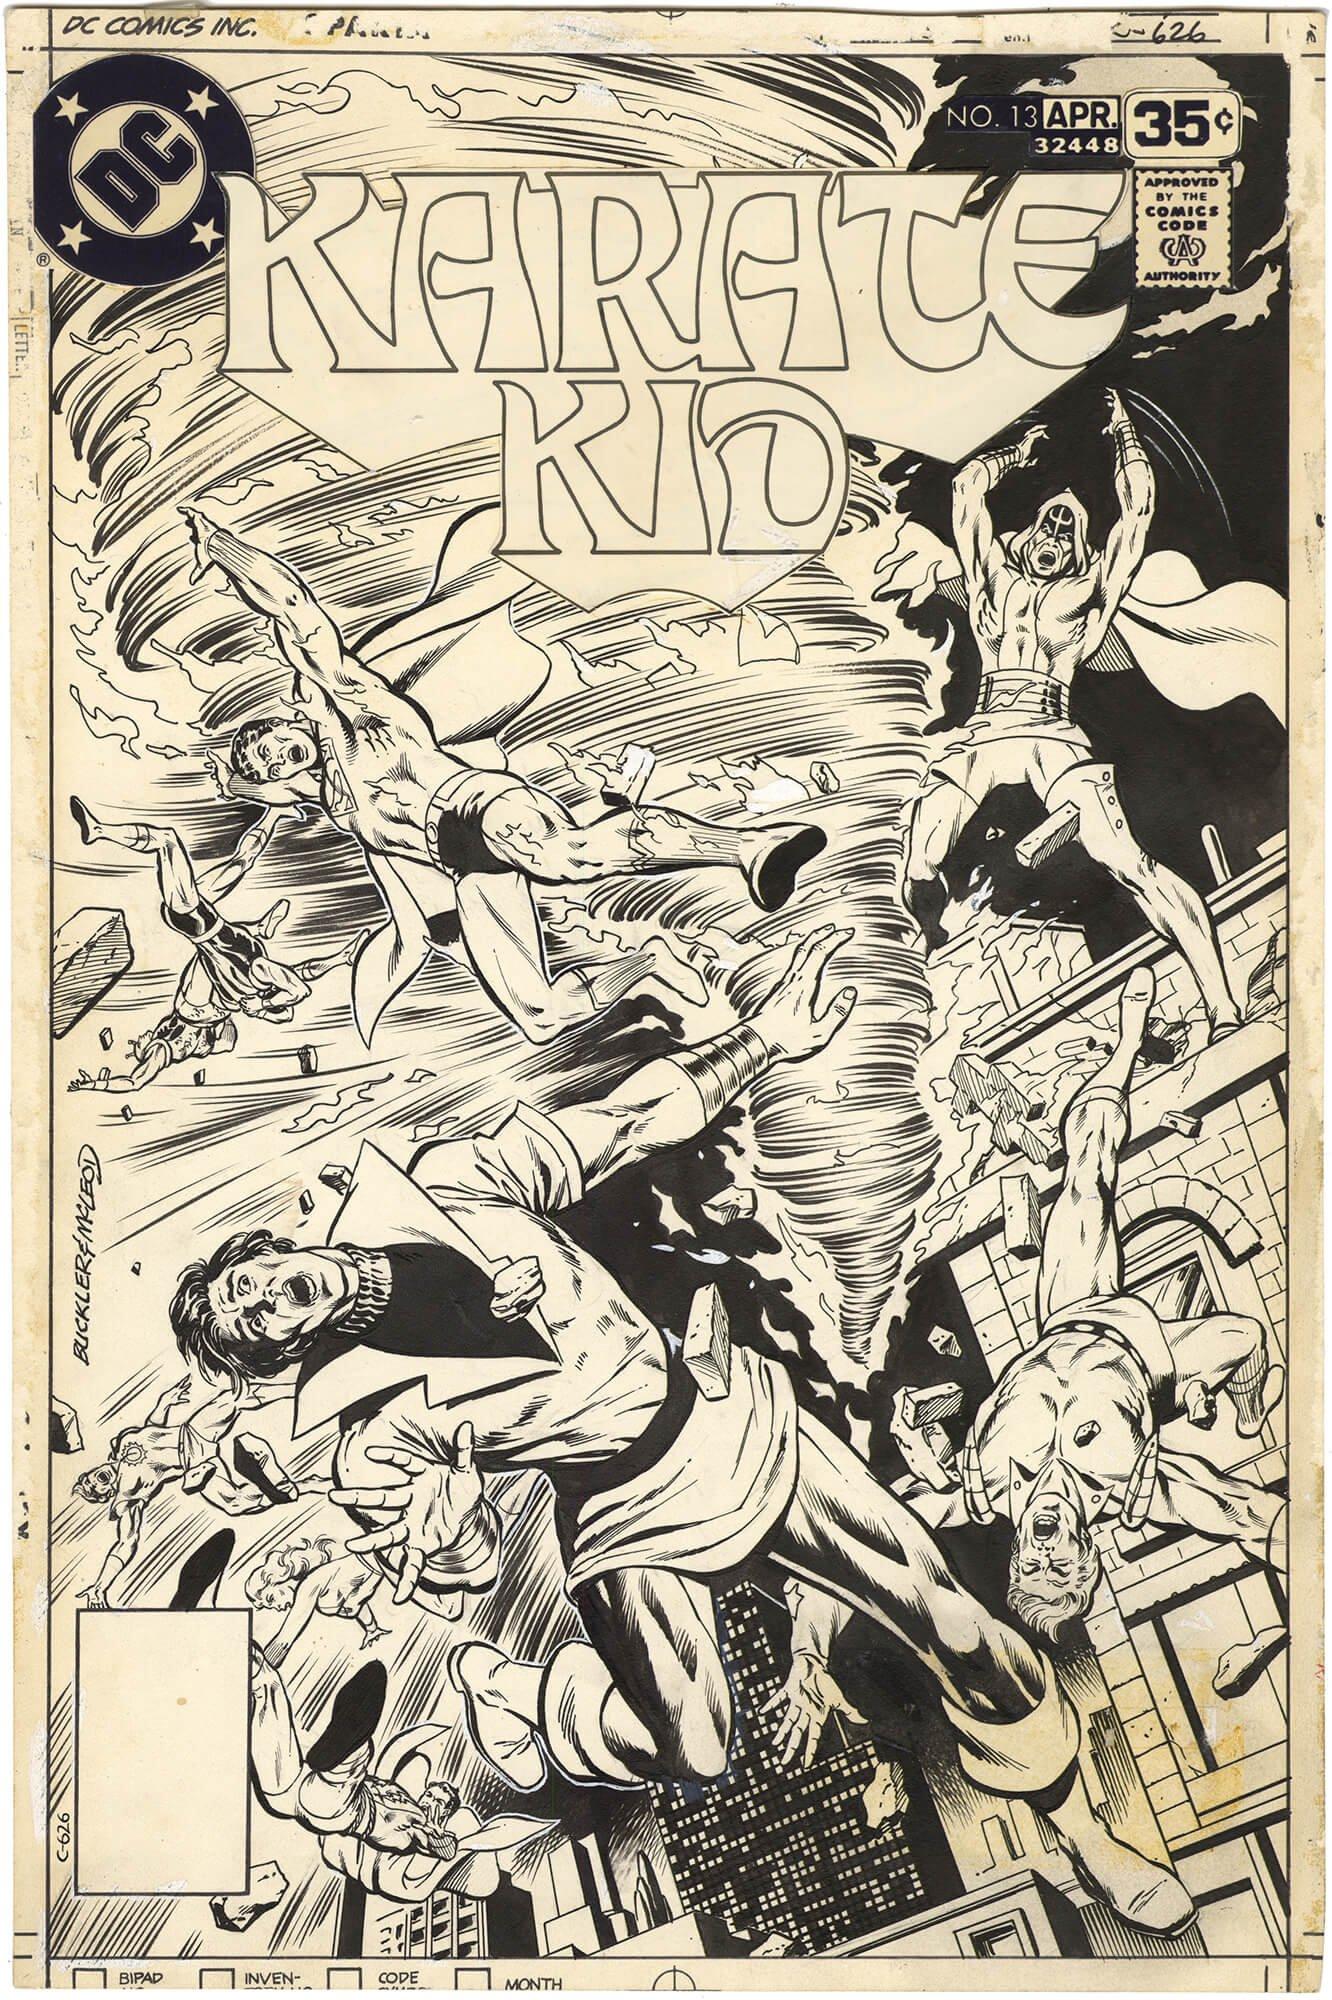 Karate Kid #13 Cover (Legion)